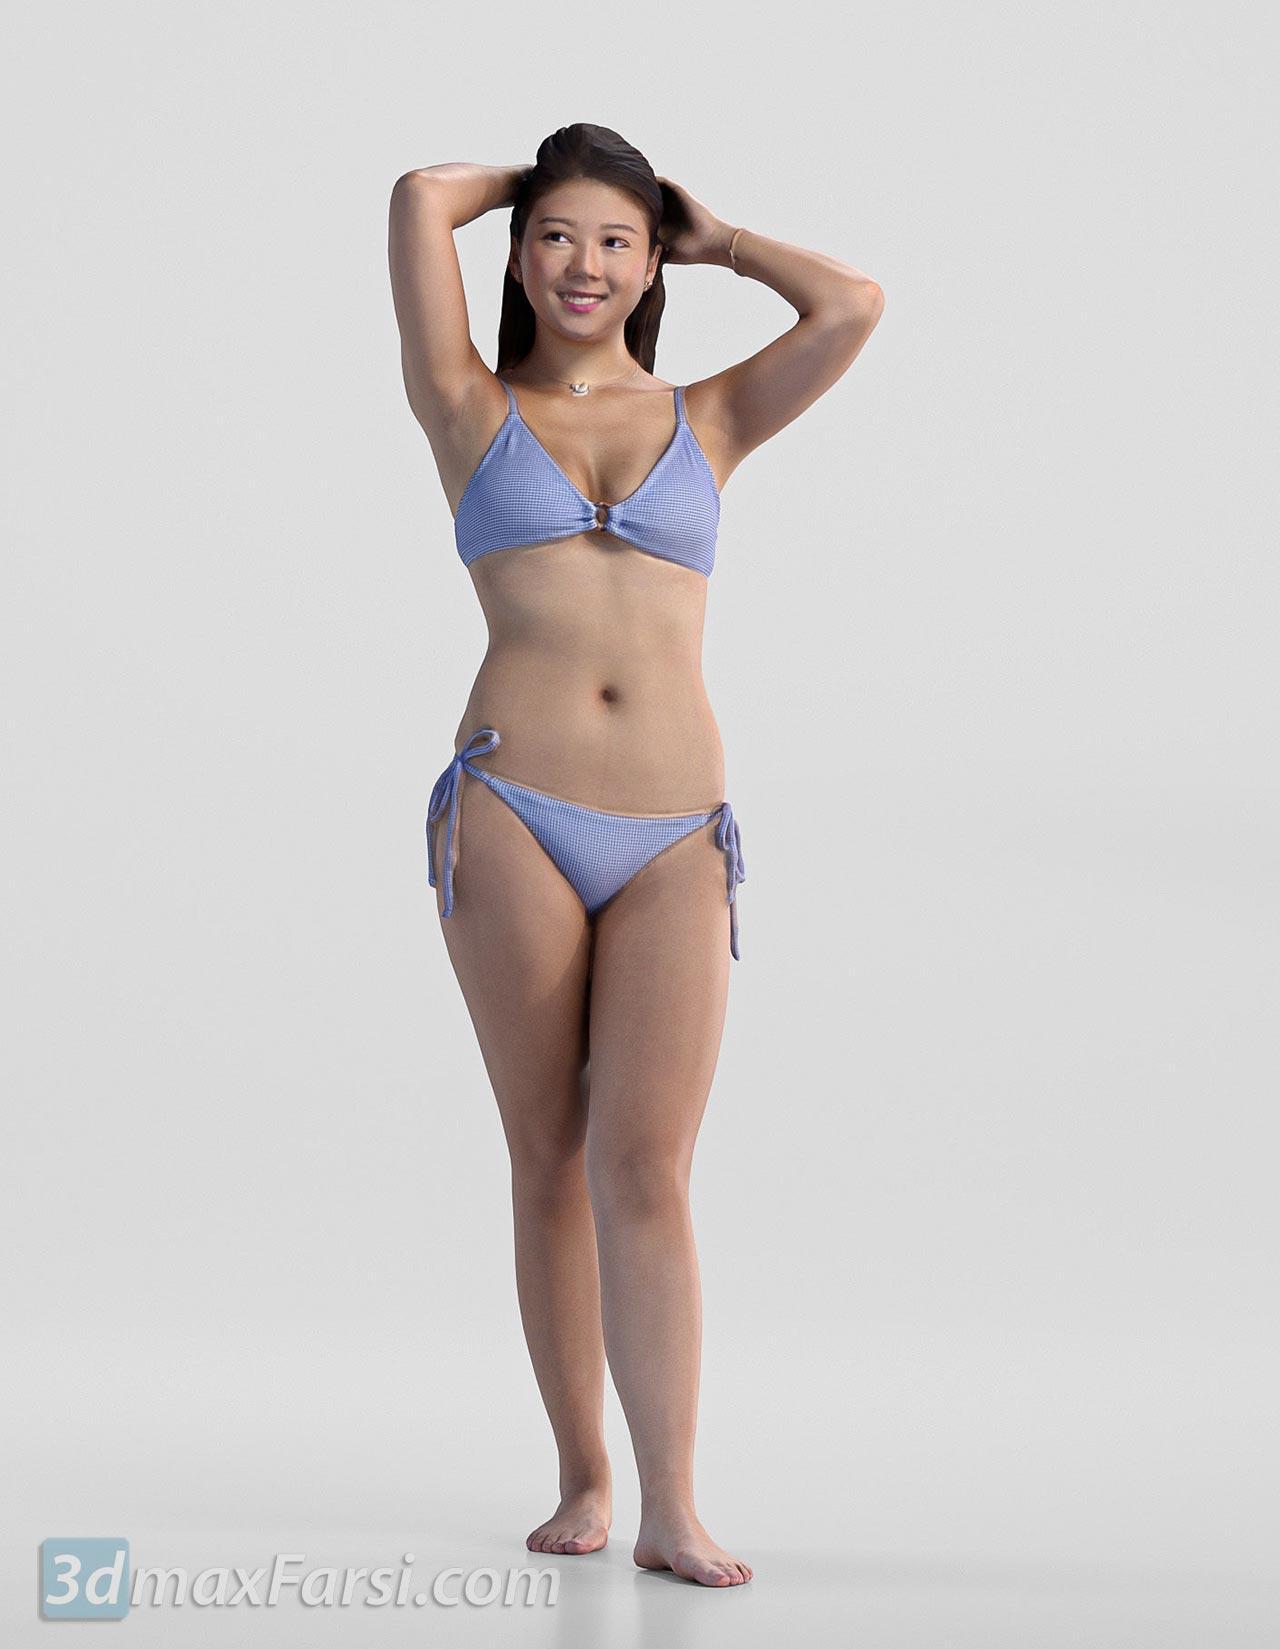 Kaylie 1174 3D model free download